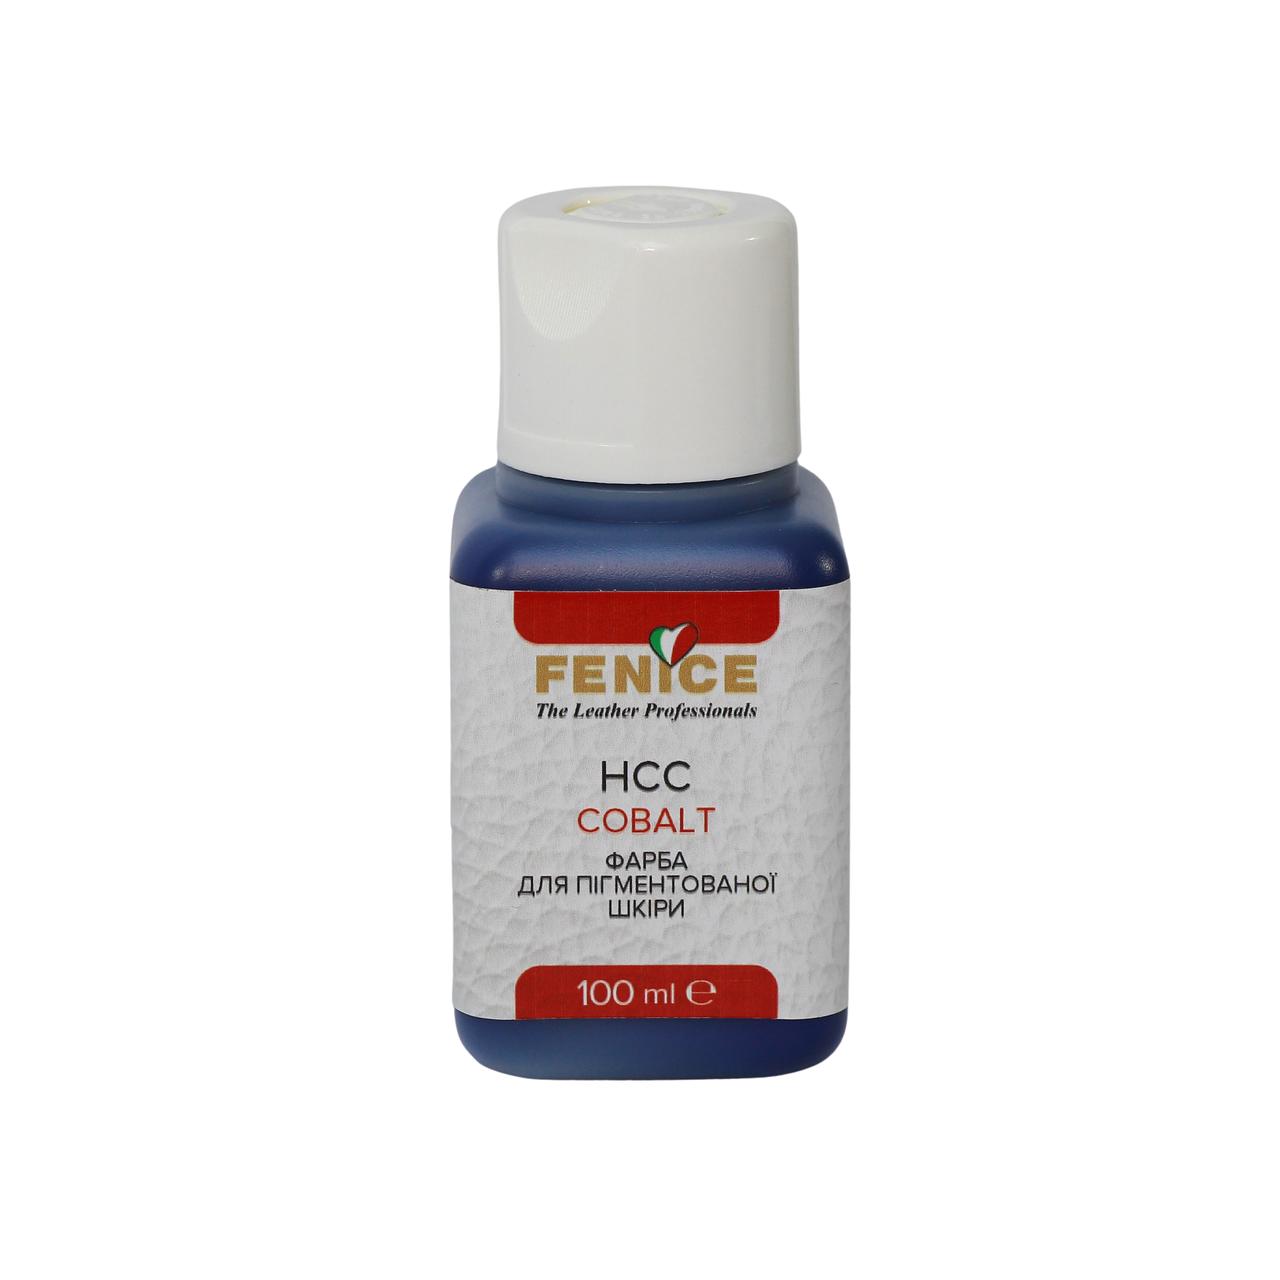 Краска для кожи Кобальт Fenice Cobalt HCC, 100 ml